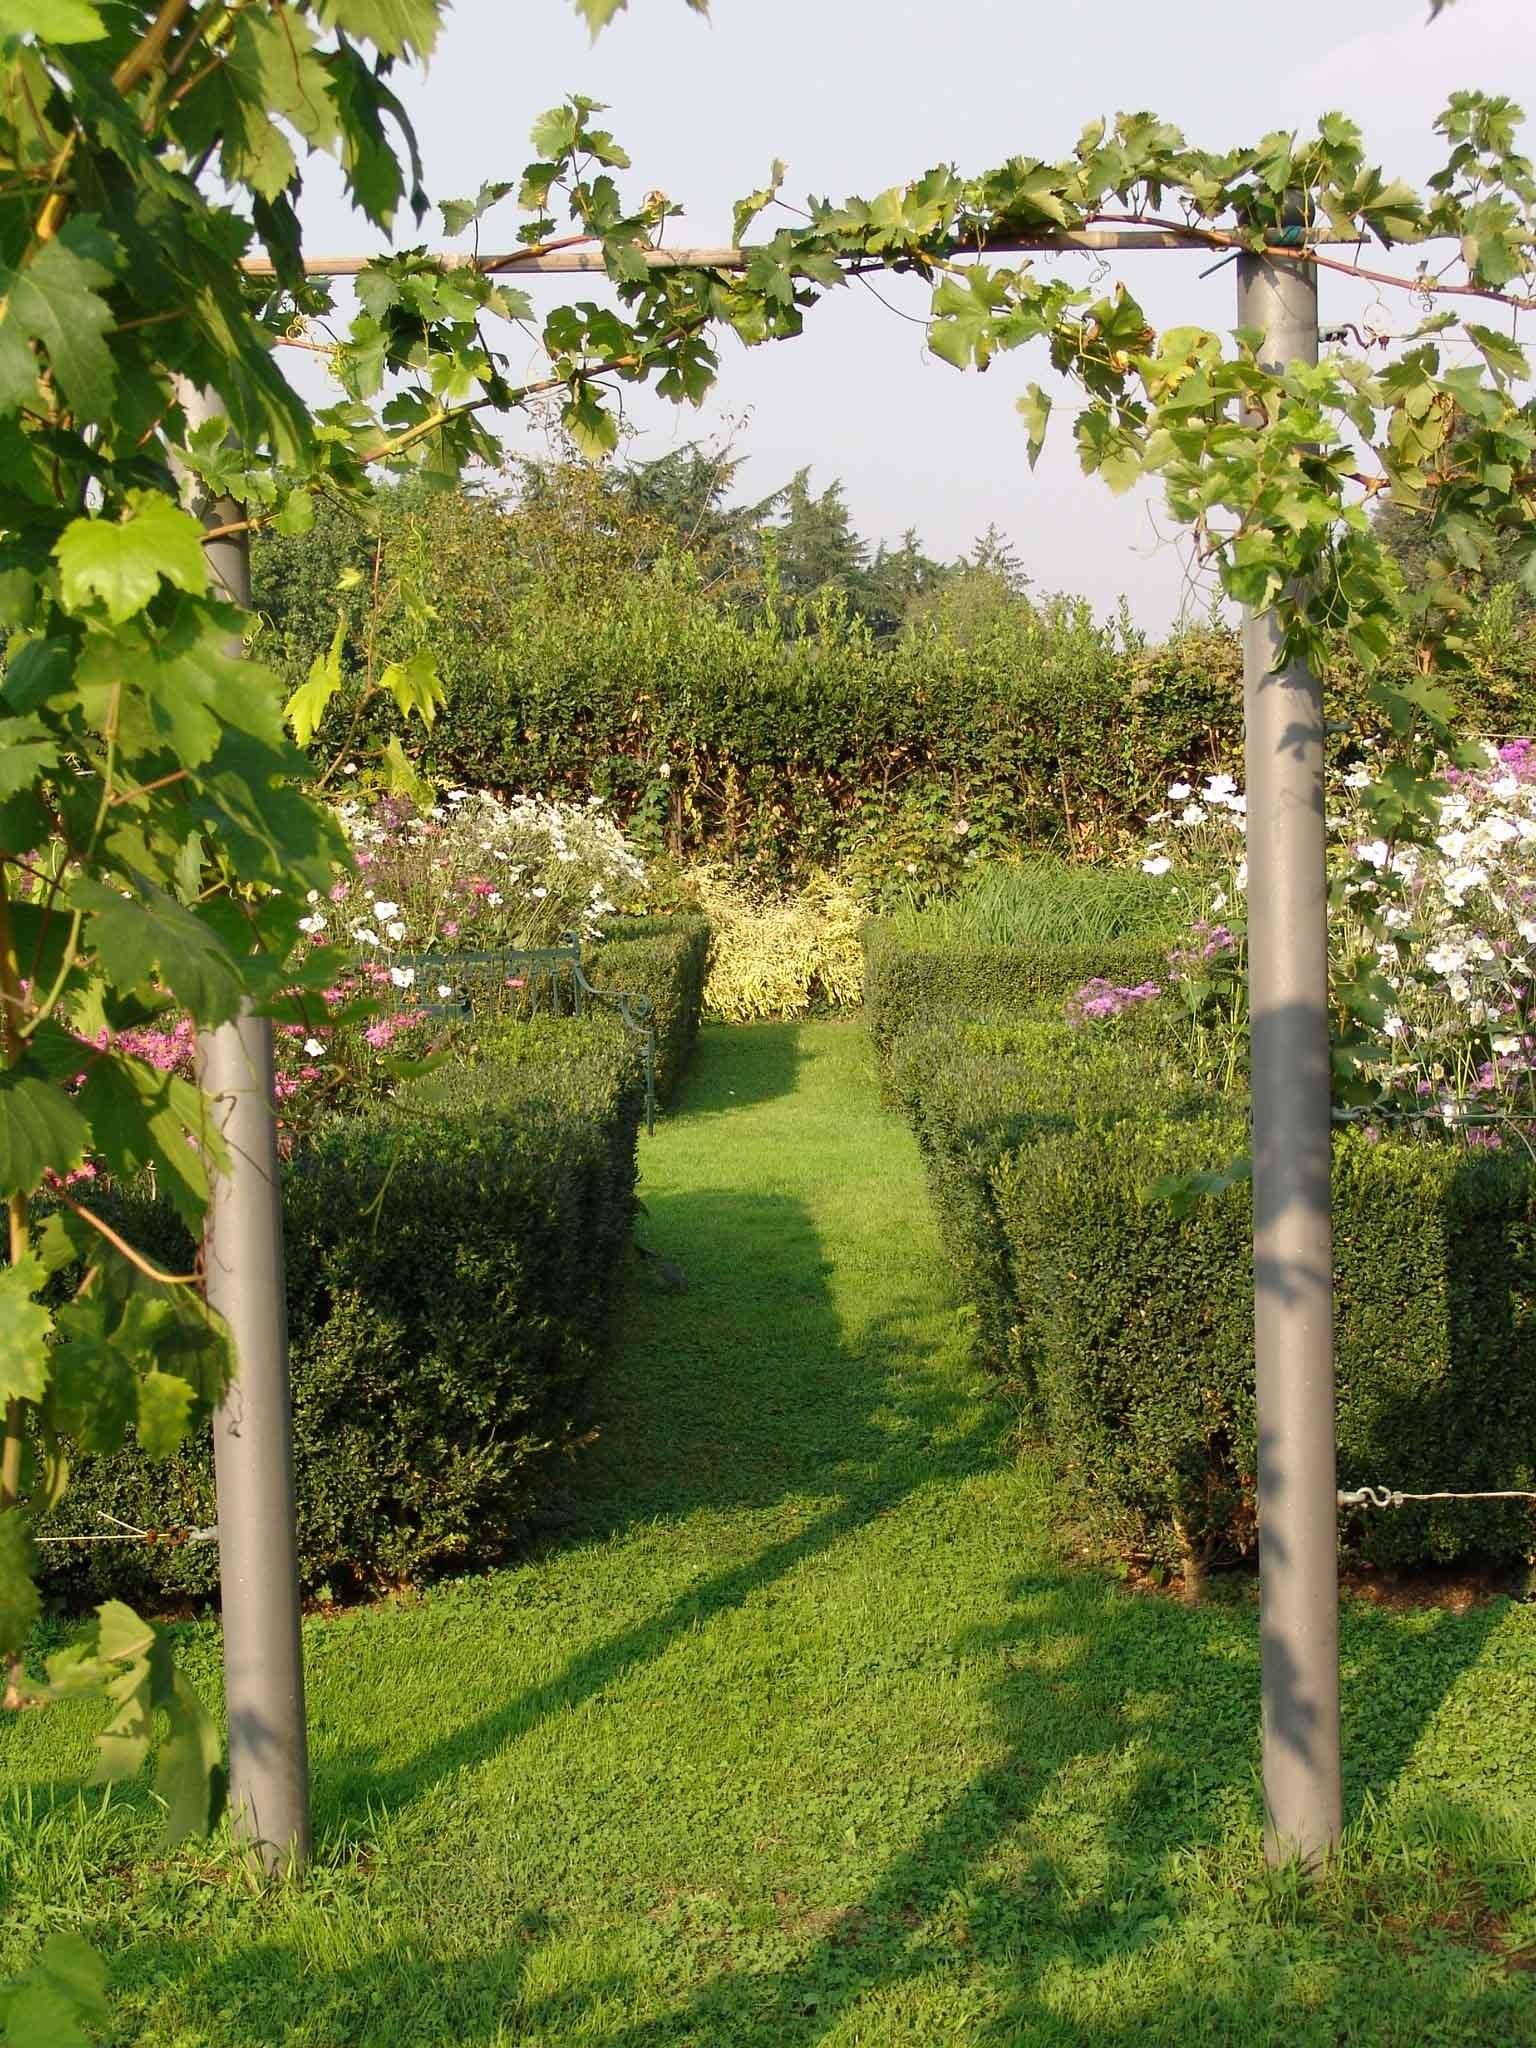 Giardini paghera parco in campagna - Giardini country ...